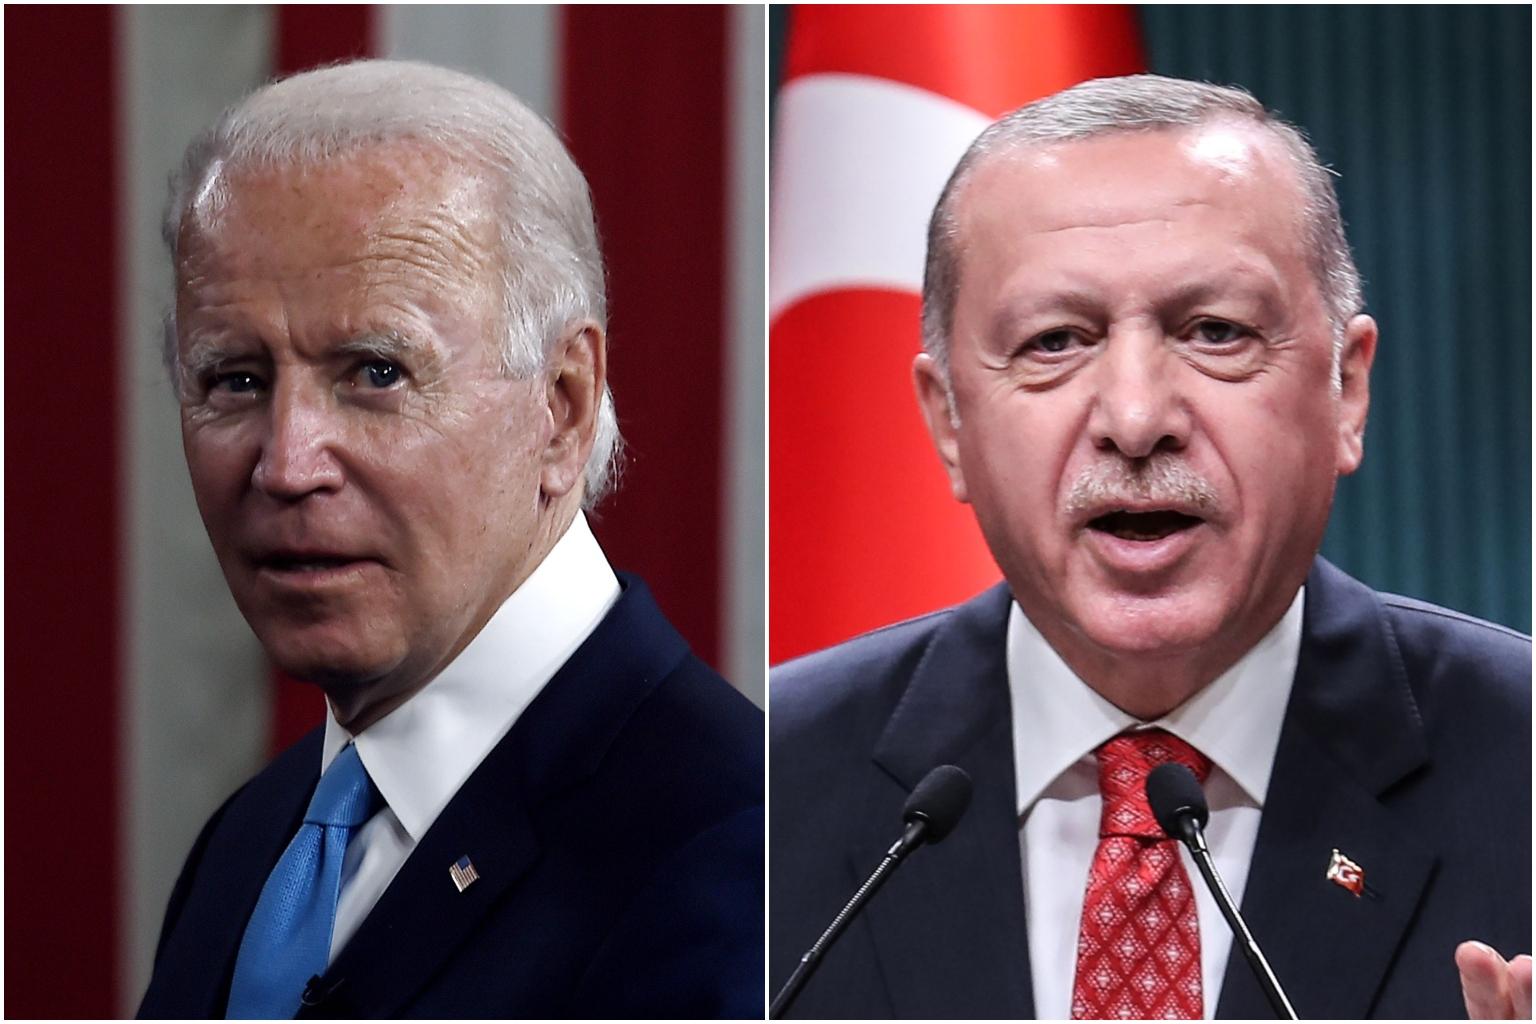 erdogan-paralajmeron-acarim-te-raporteve-me-ameriken